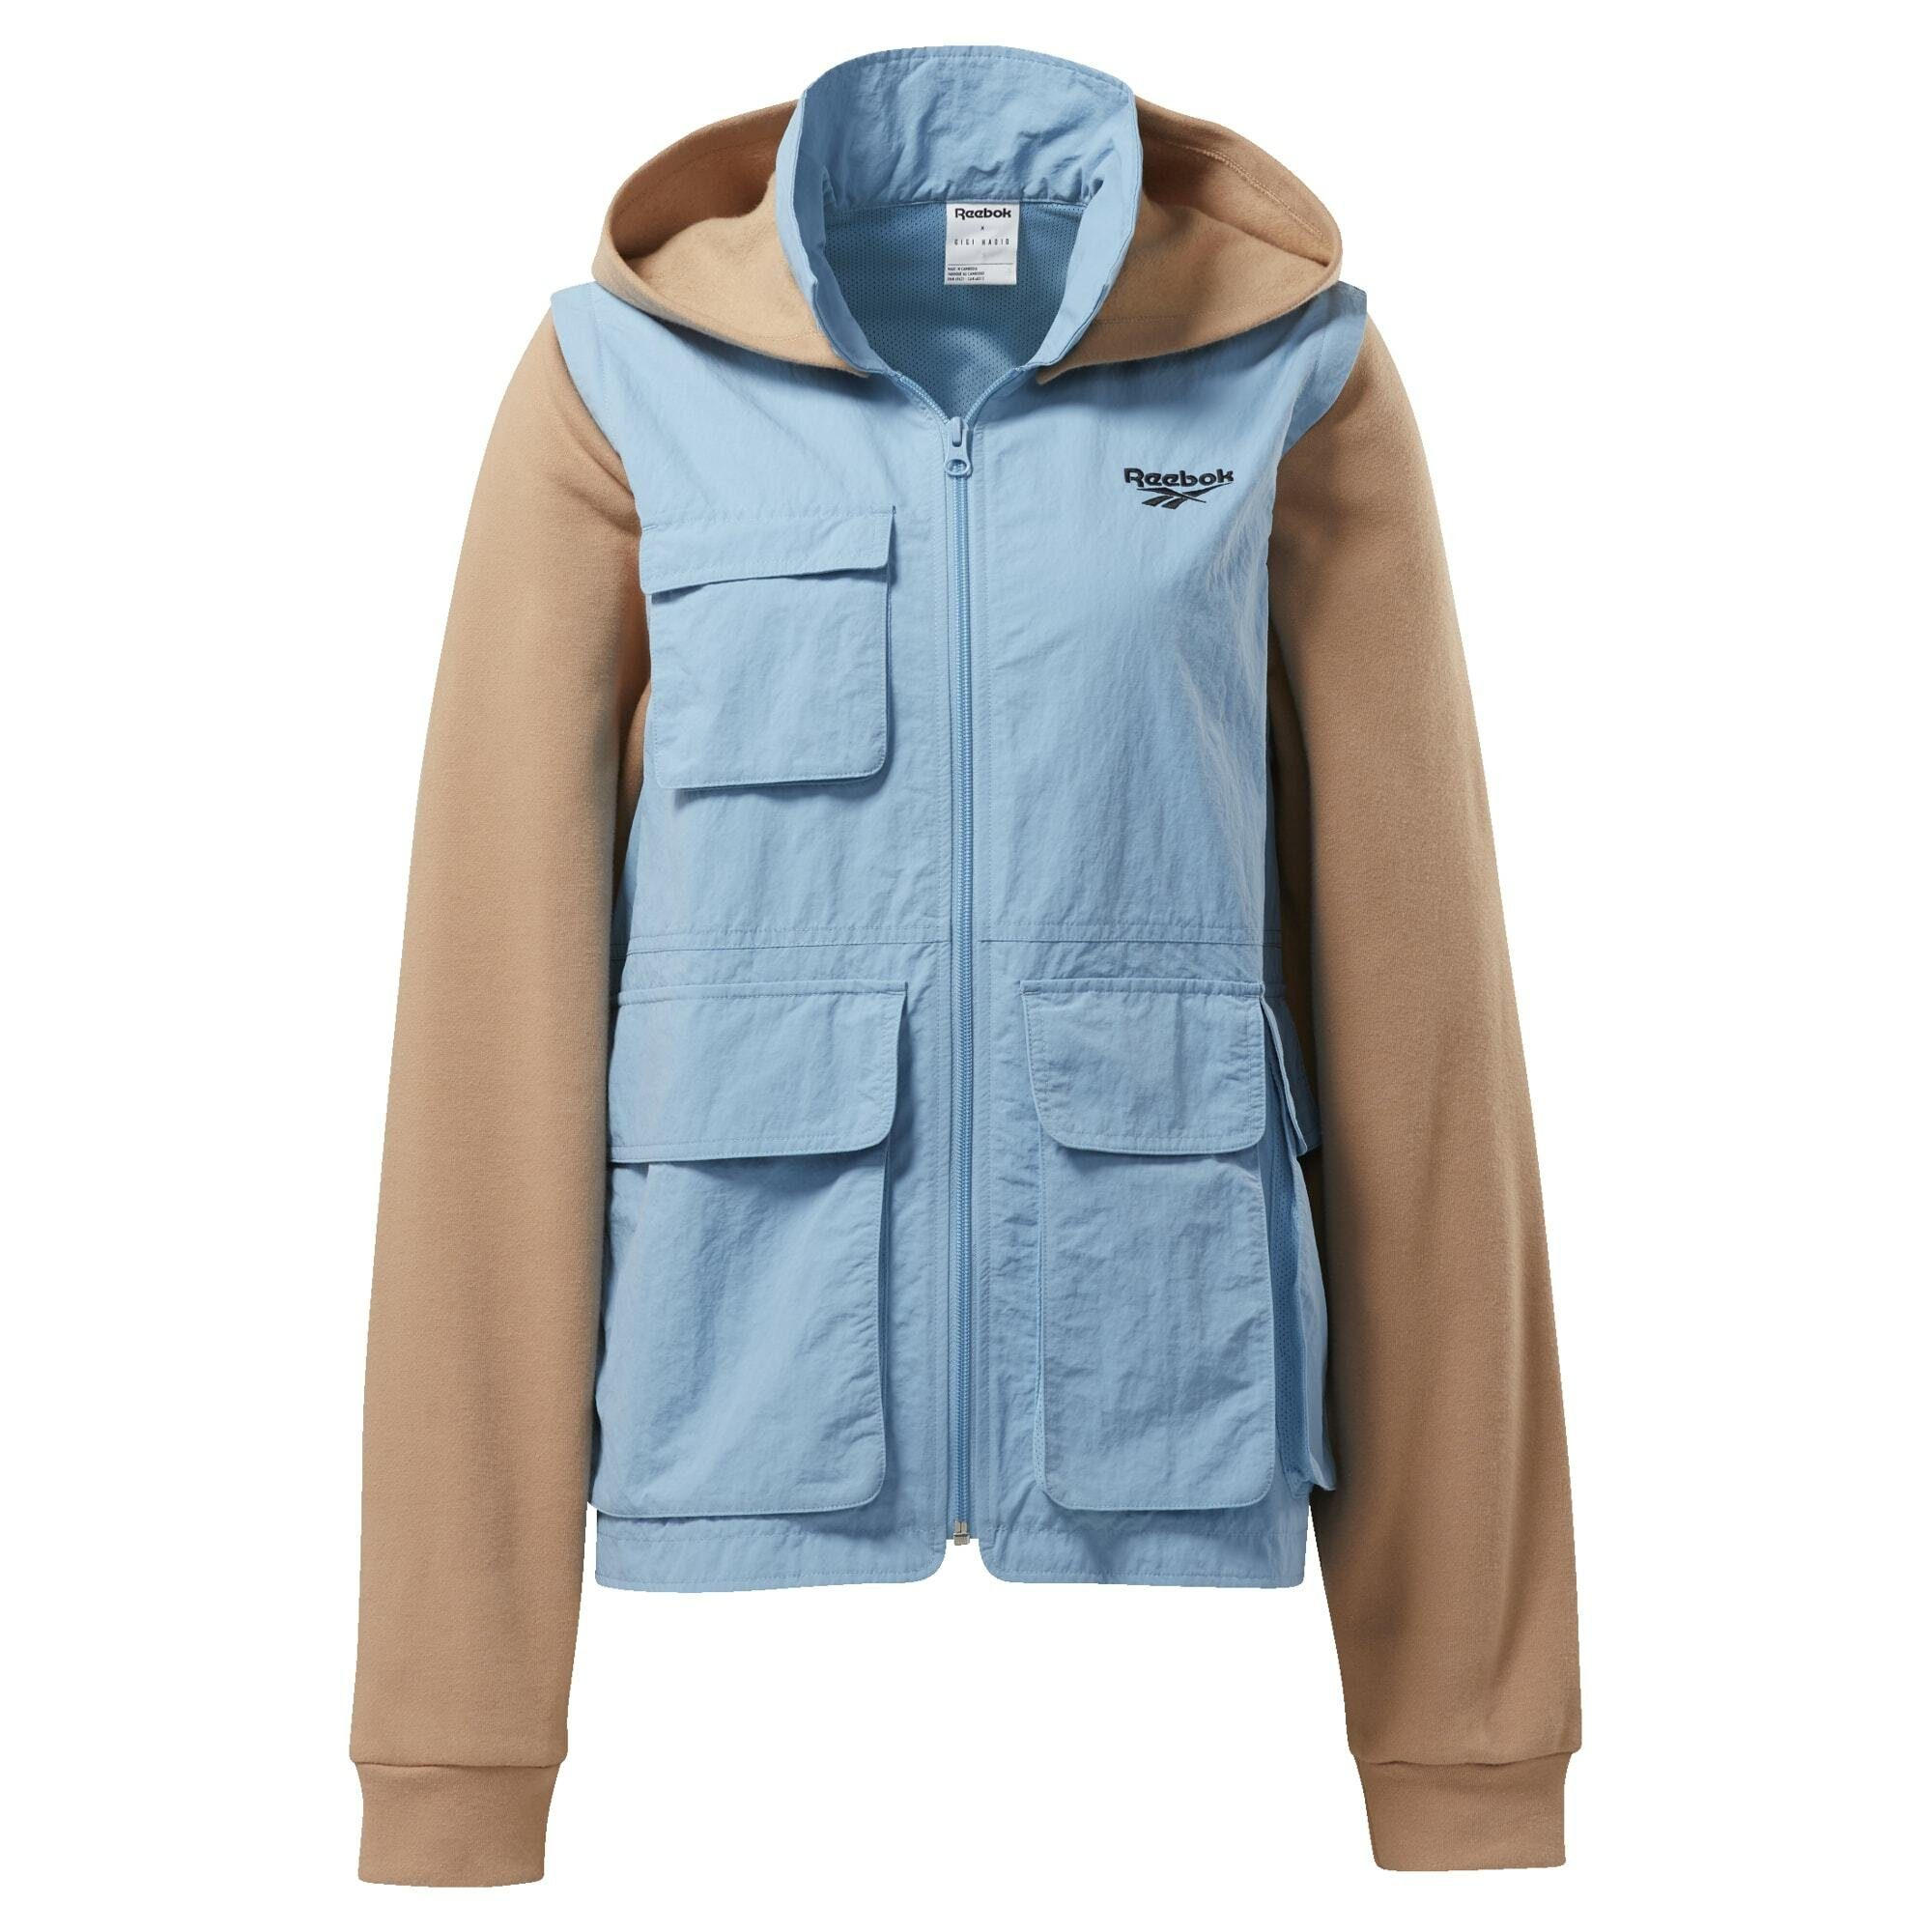 Gigi Hadid Convertible Jacket